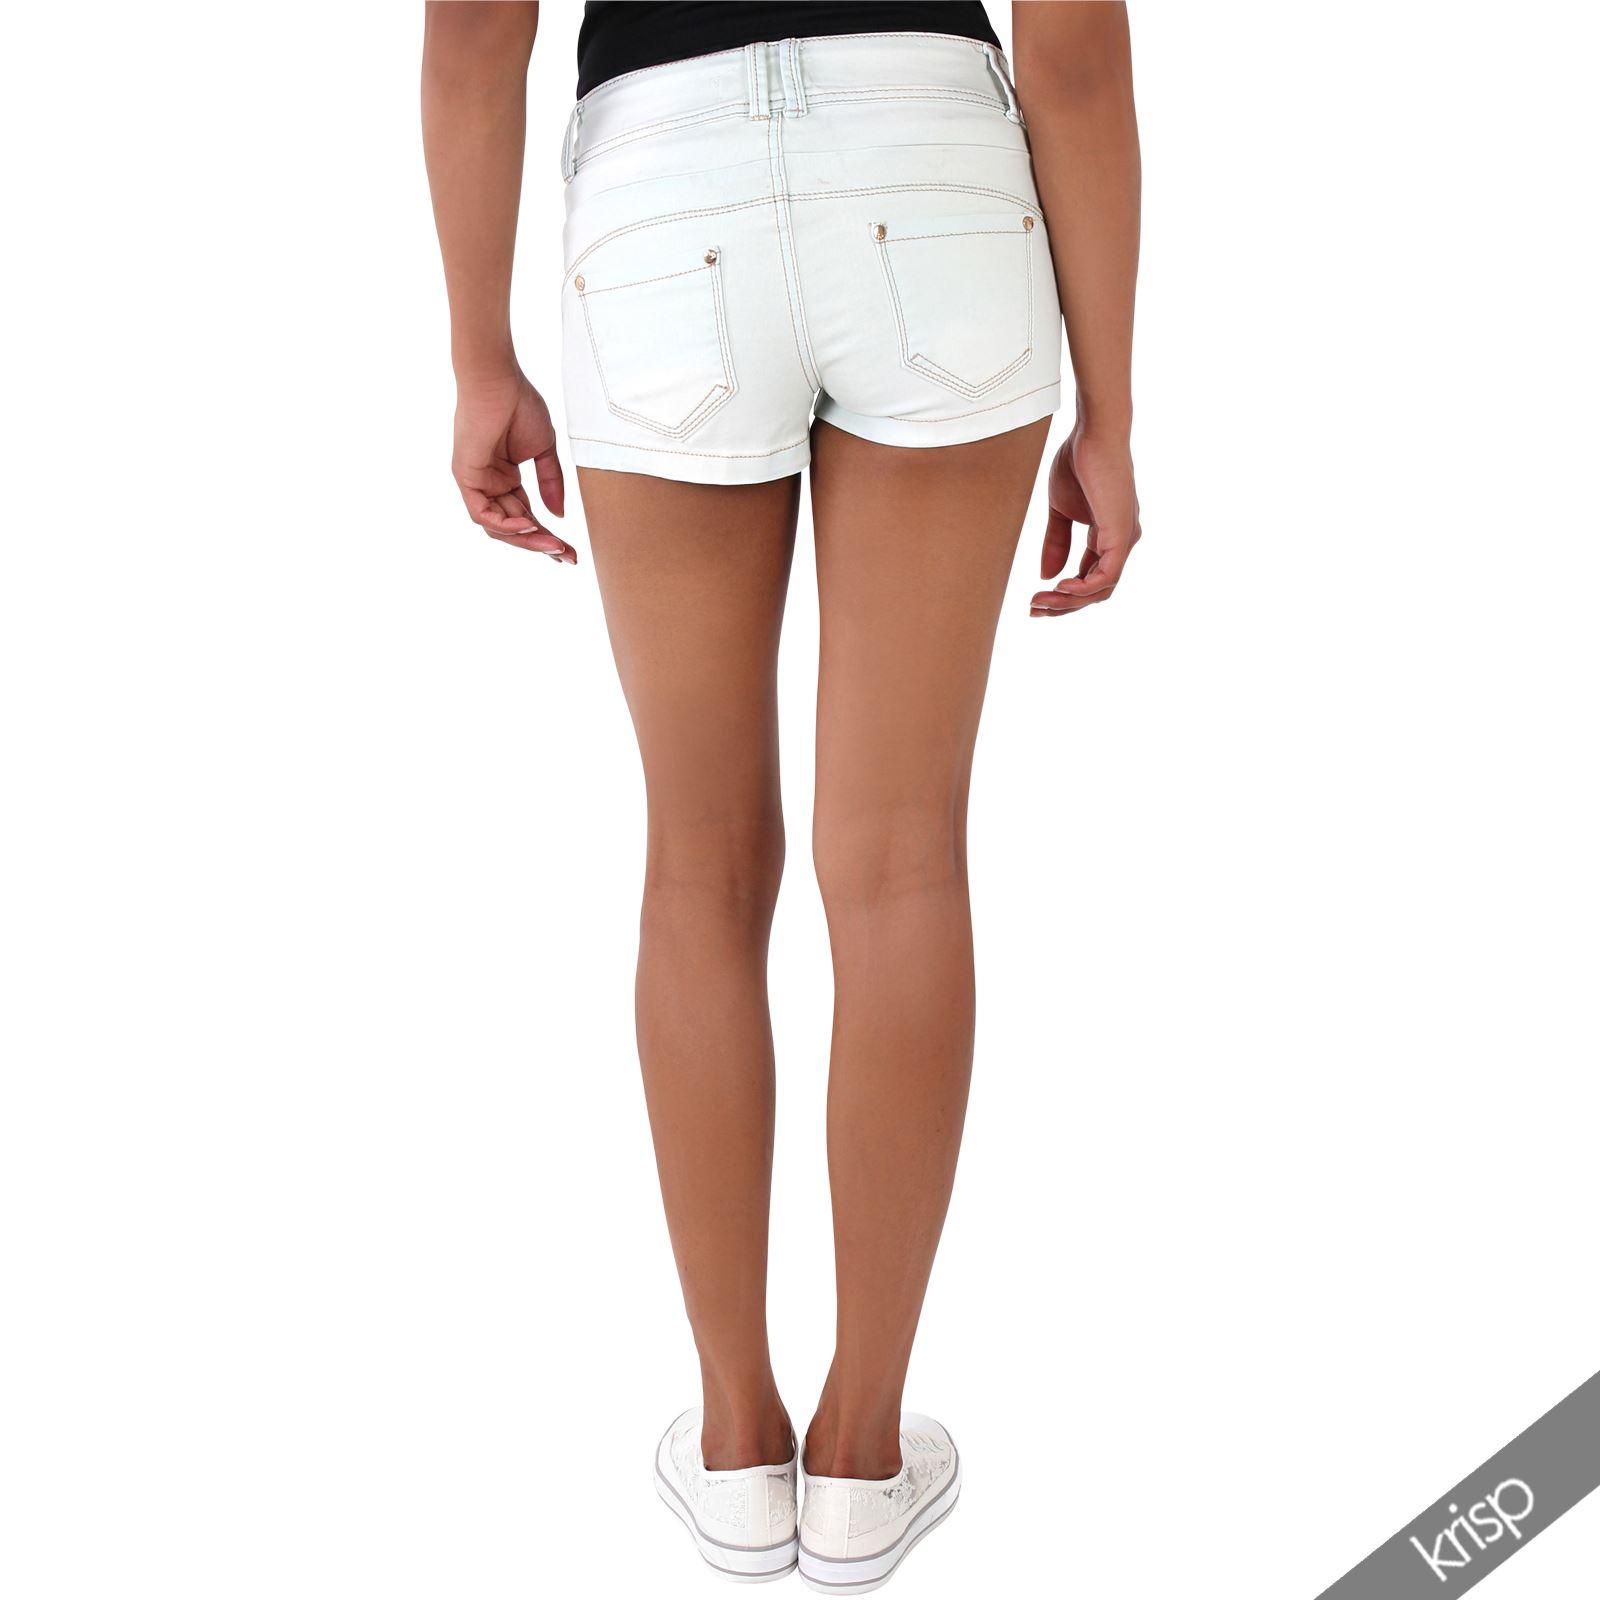 denim micro shorts - photo #7